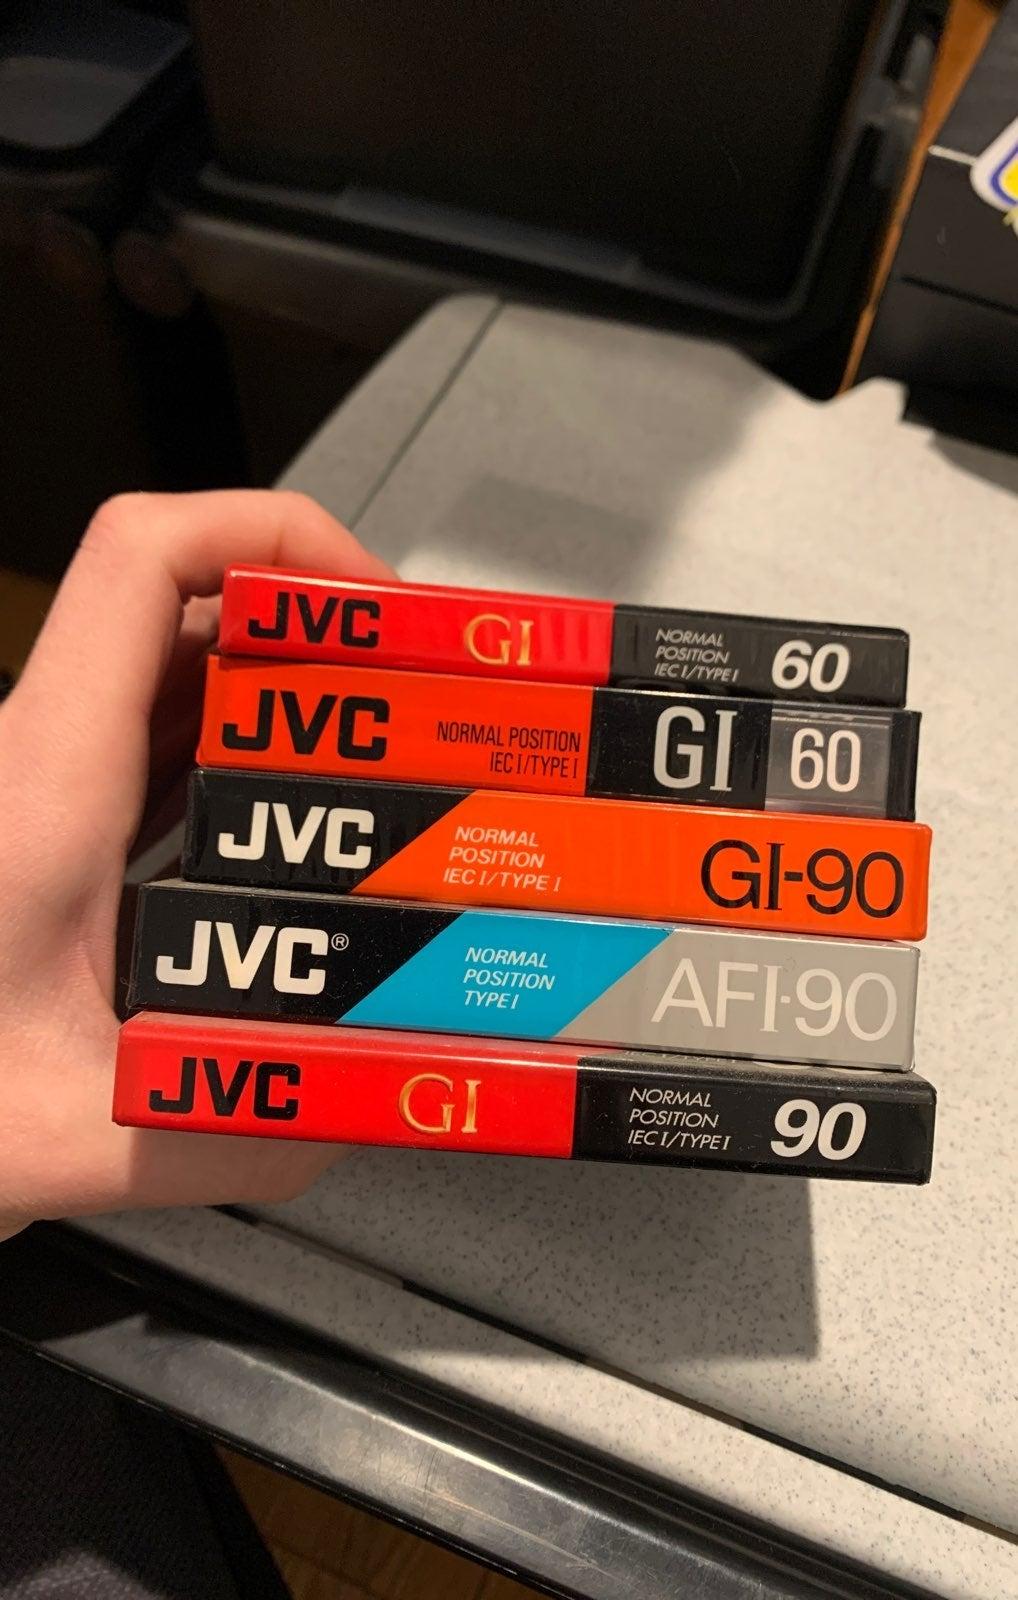 Lot of 5 jvc blank cassettes